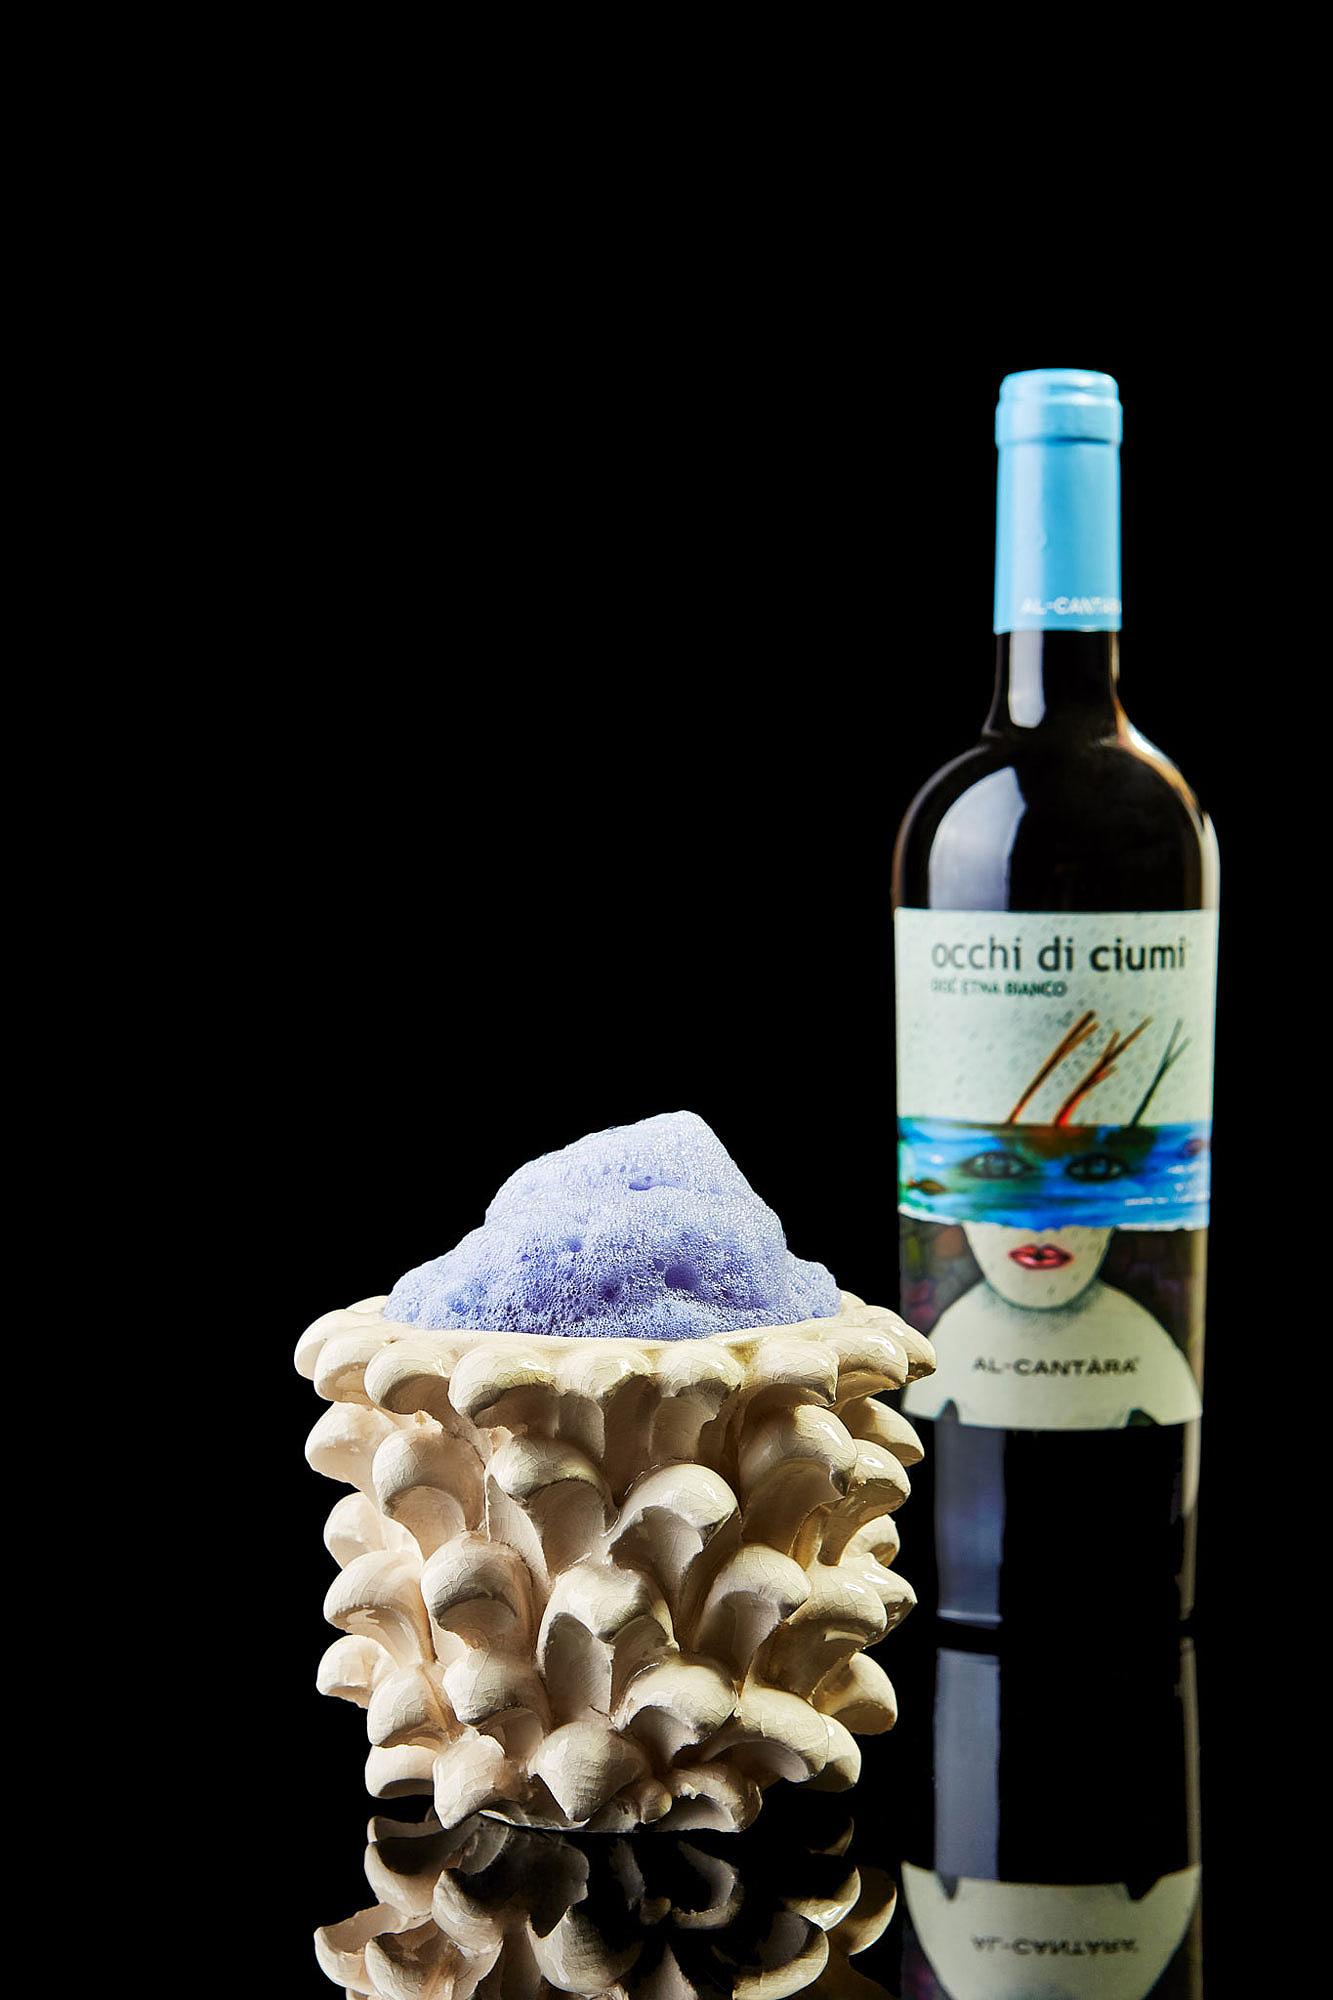 AL-Lasanté_cocktail_Fabio_camboni_Al-Cantara (3)